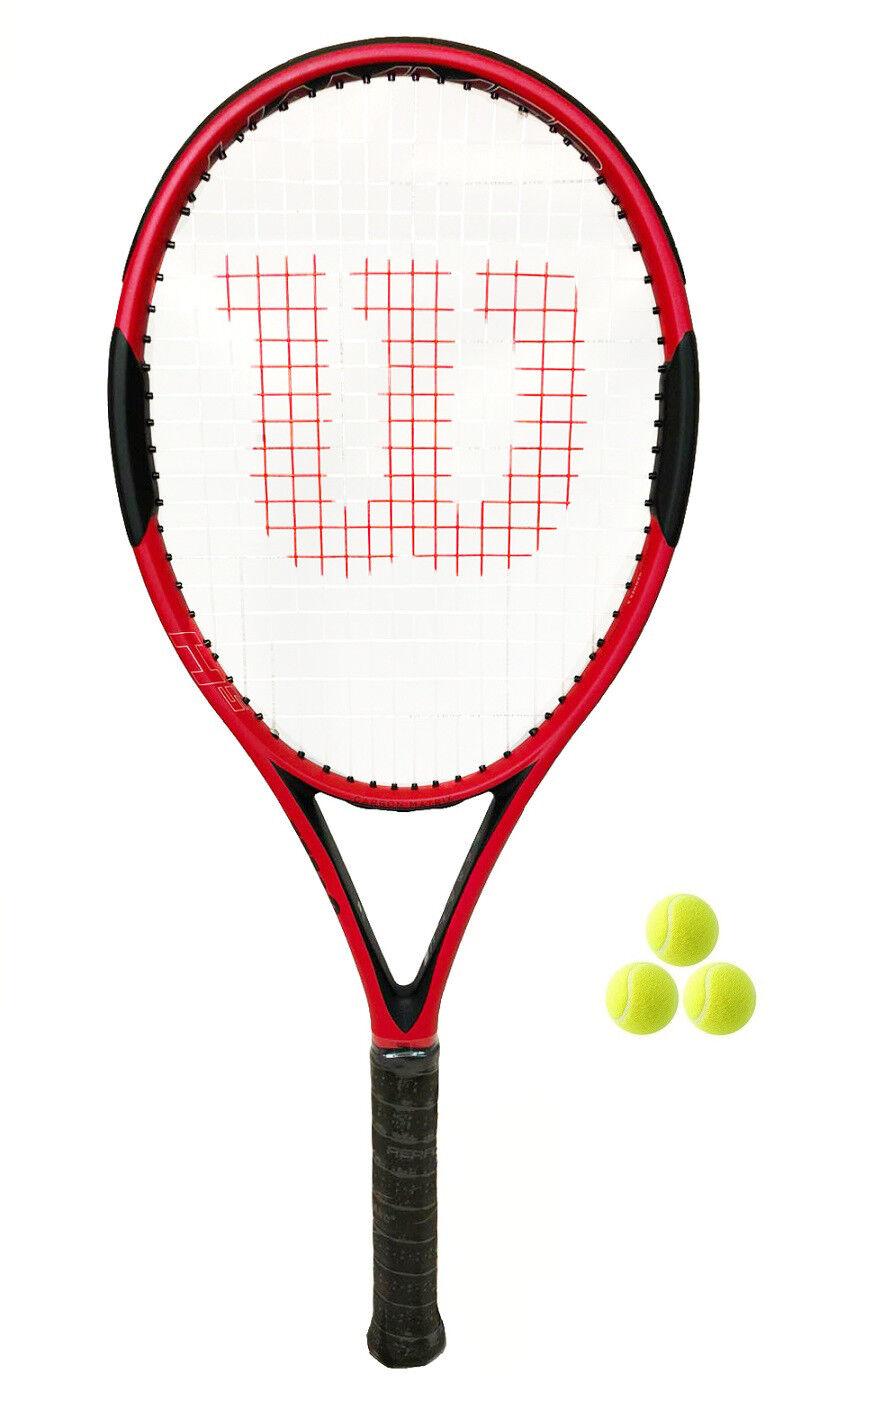 WILSON HAMMER RACCHETTA DA TENNIS H5 + 3 Palline Da Tennis RRP